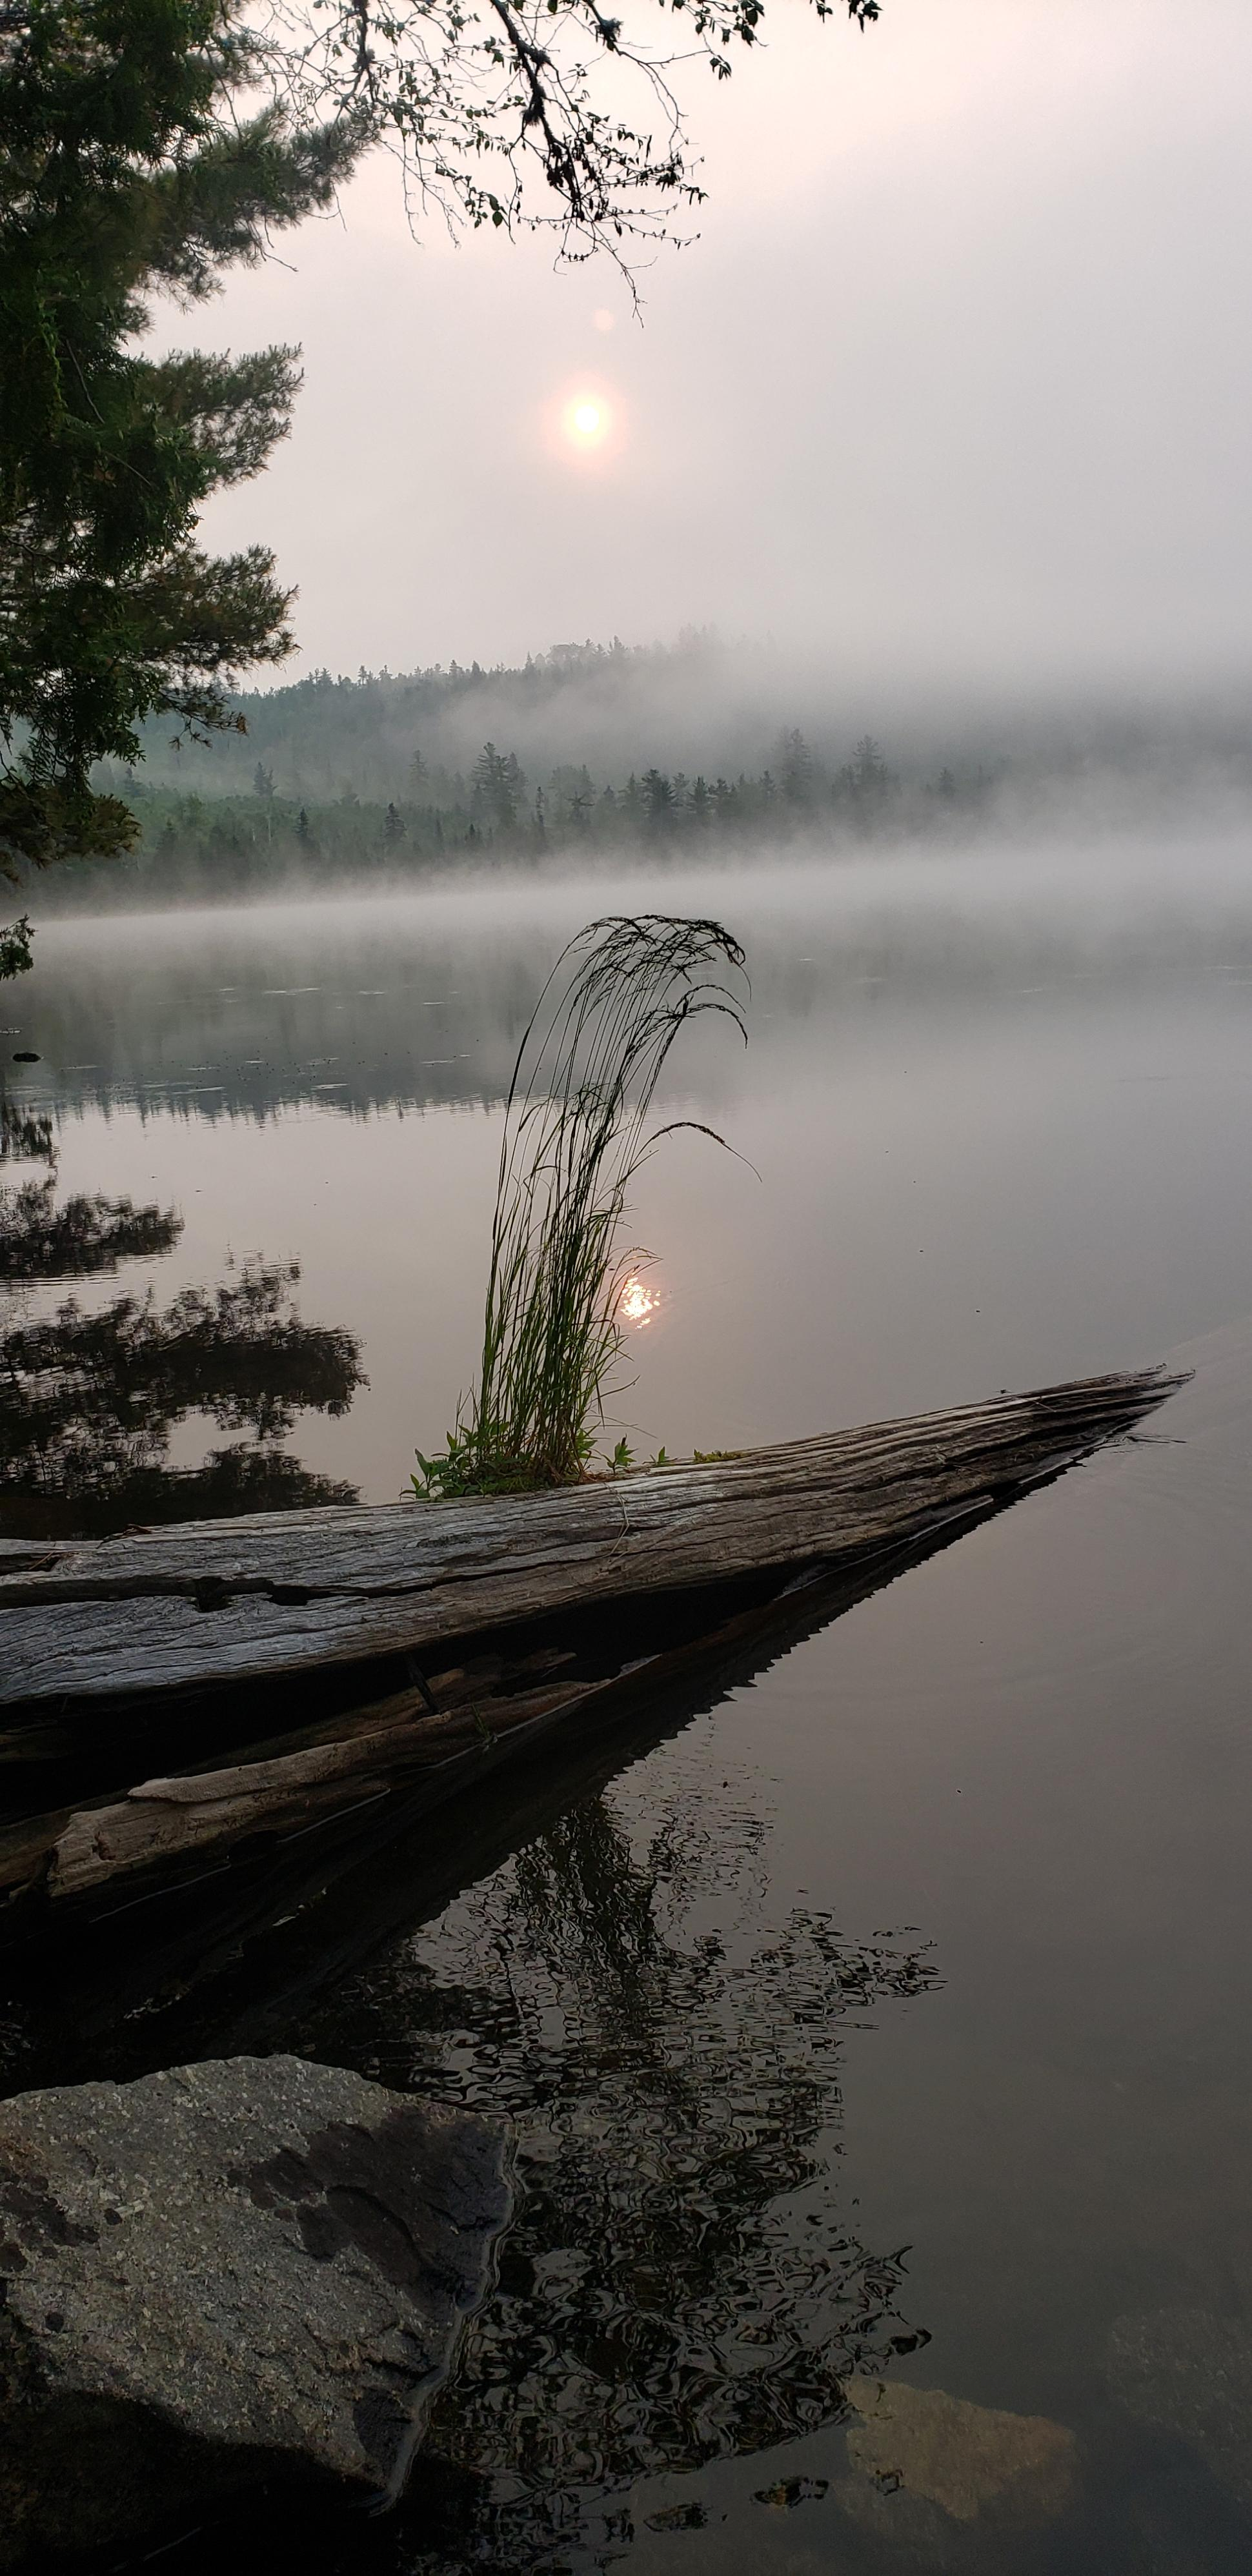 Sunrise,Little Caribou,July 7, 2019, 6:36am